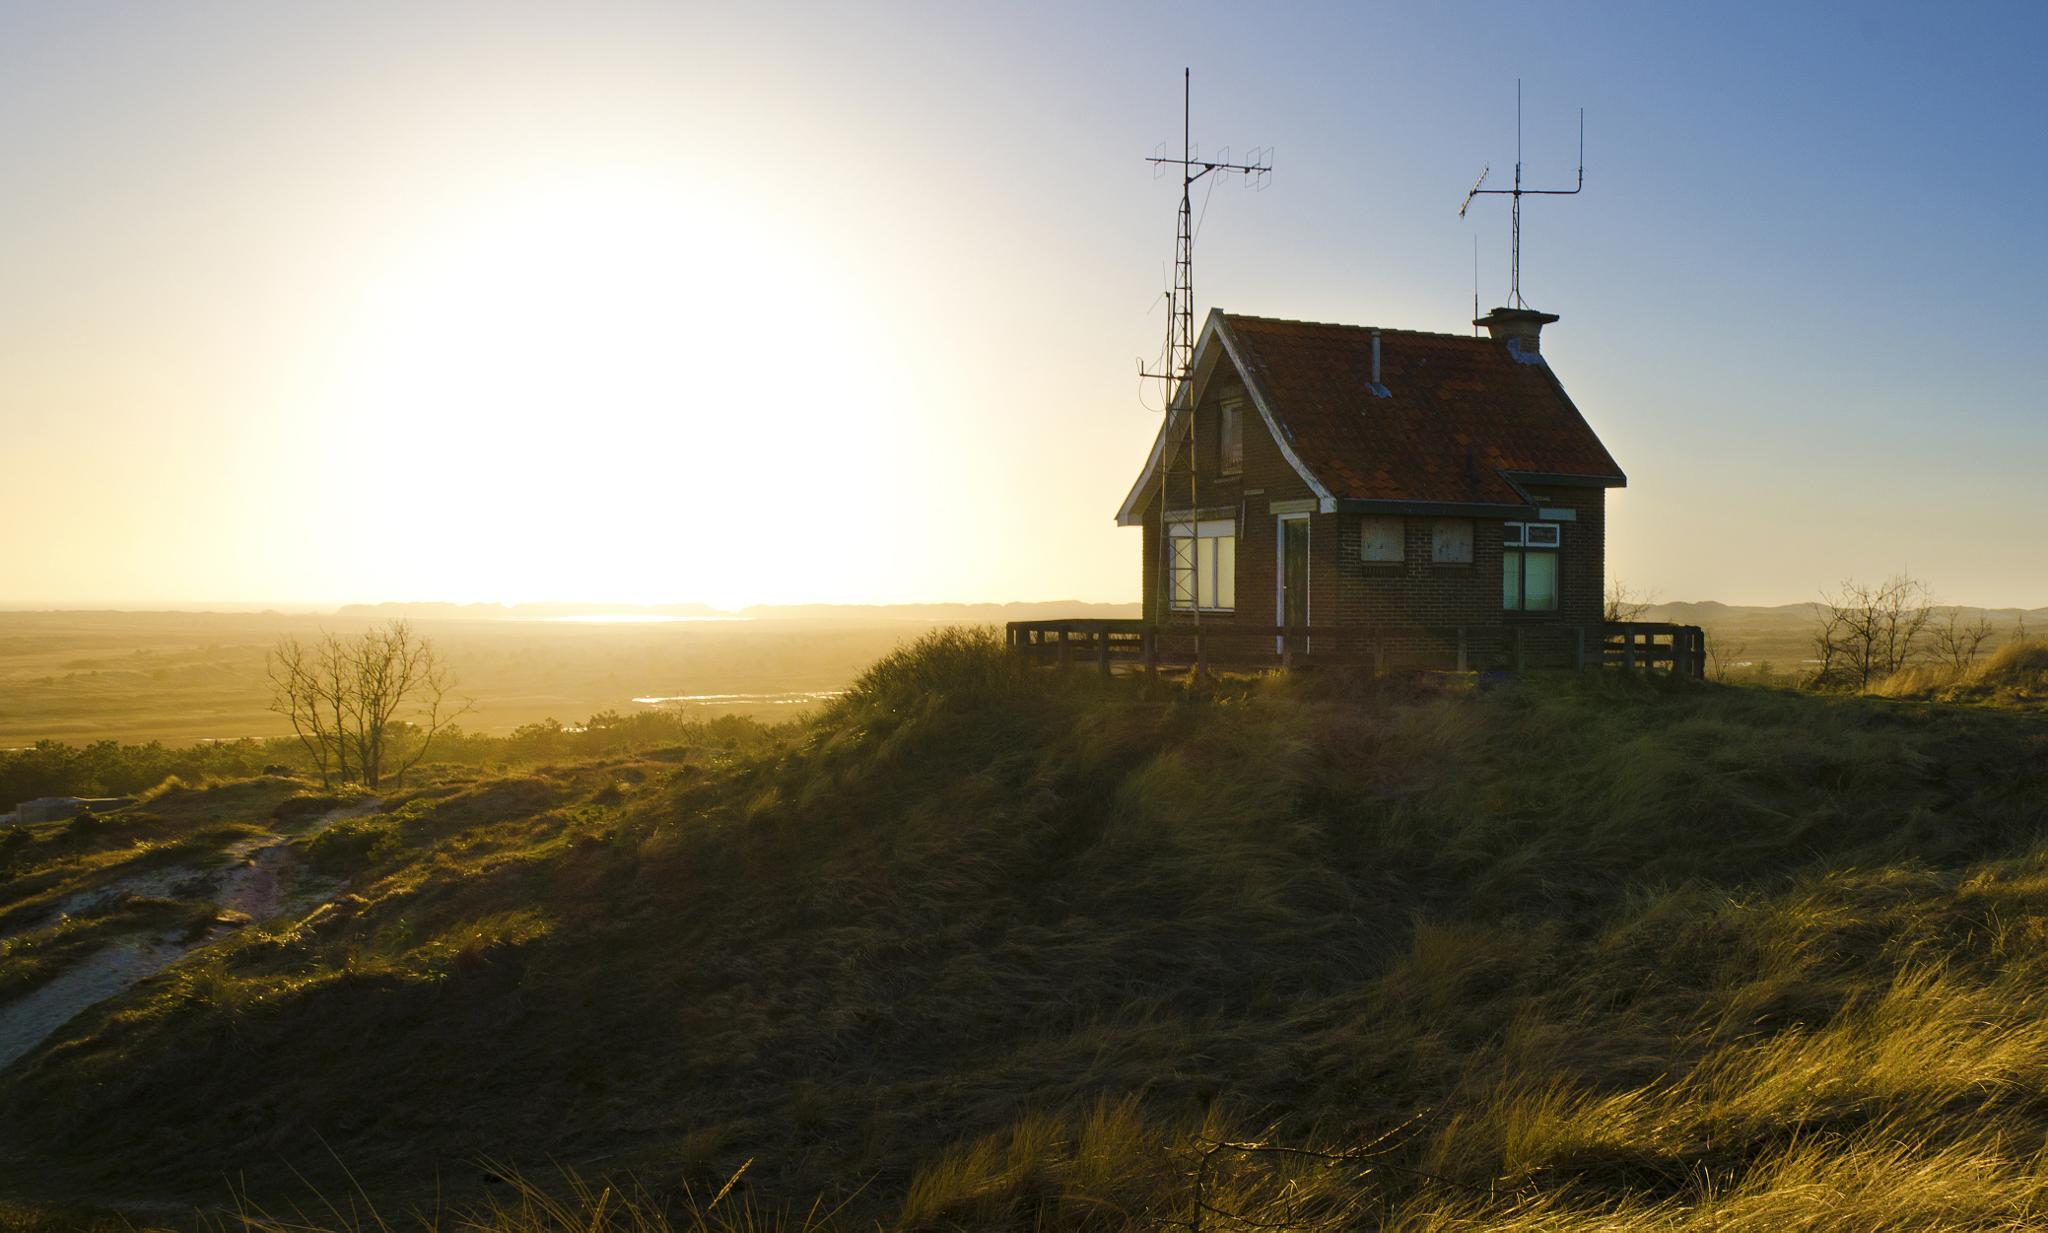 Radiohouse by Cynthia Hasenbos